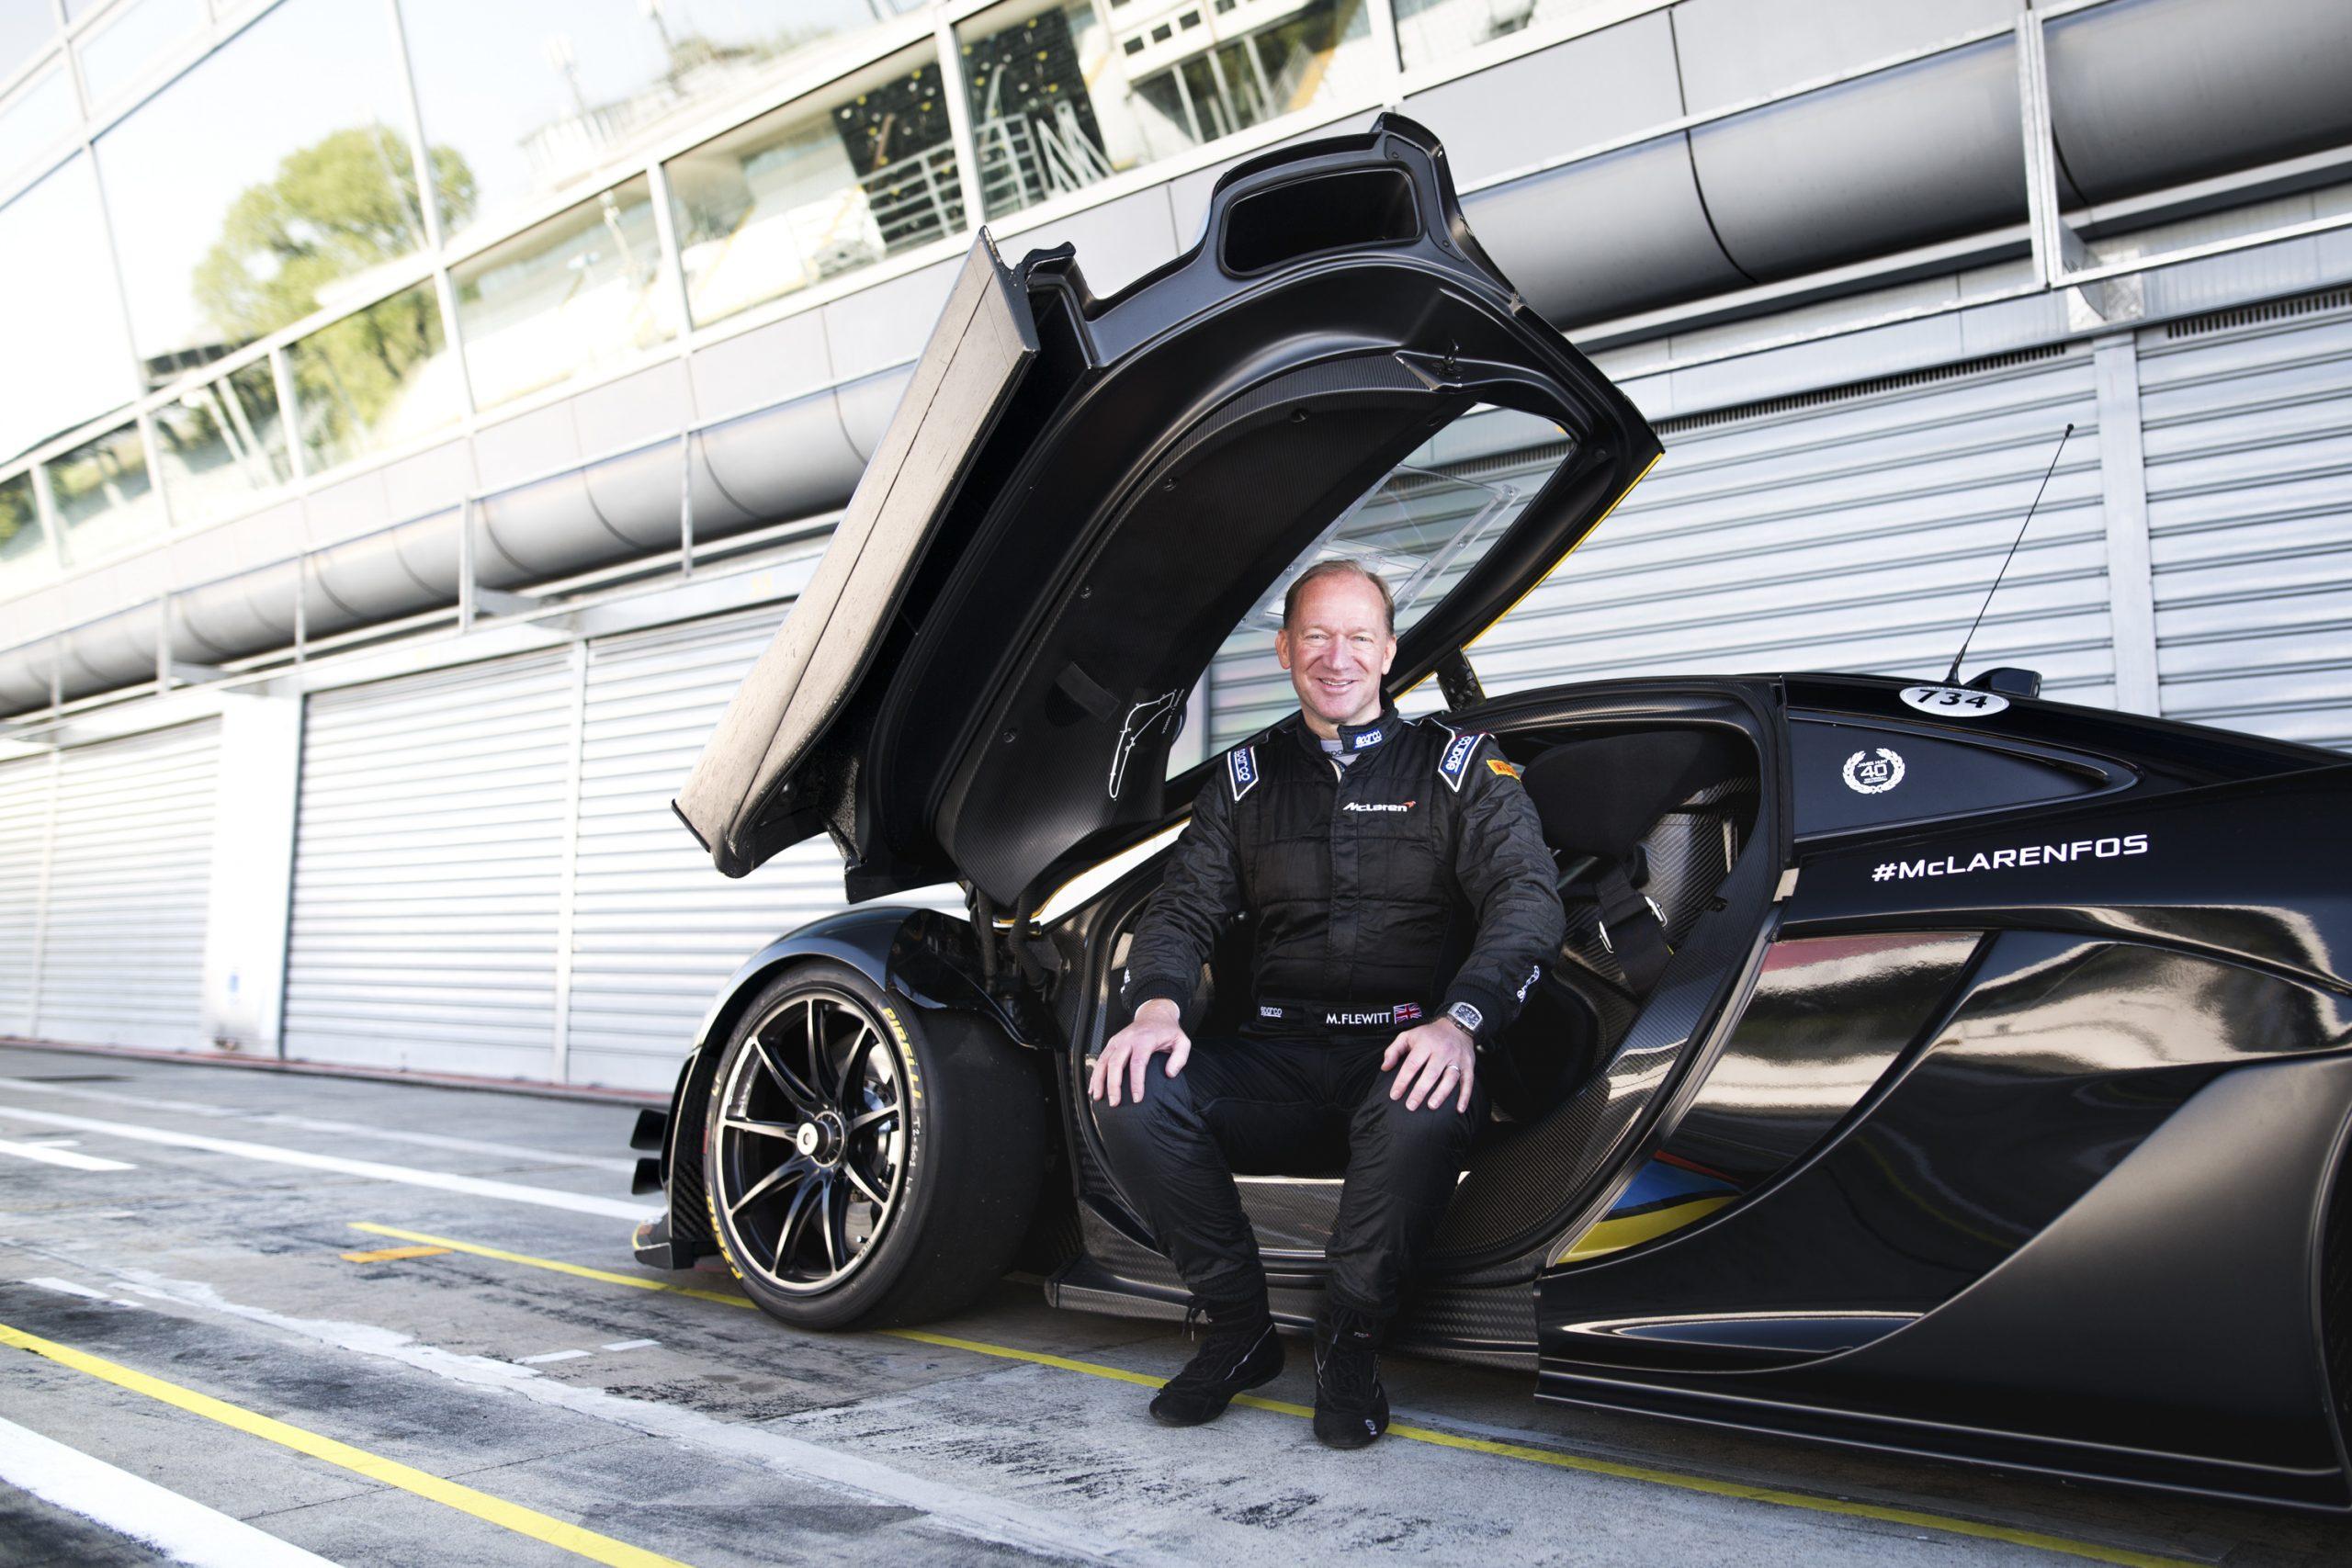 McLaren CEO Mike Flewitt sitting in a McLaren